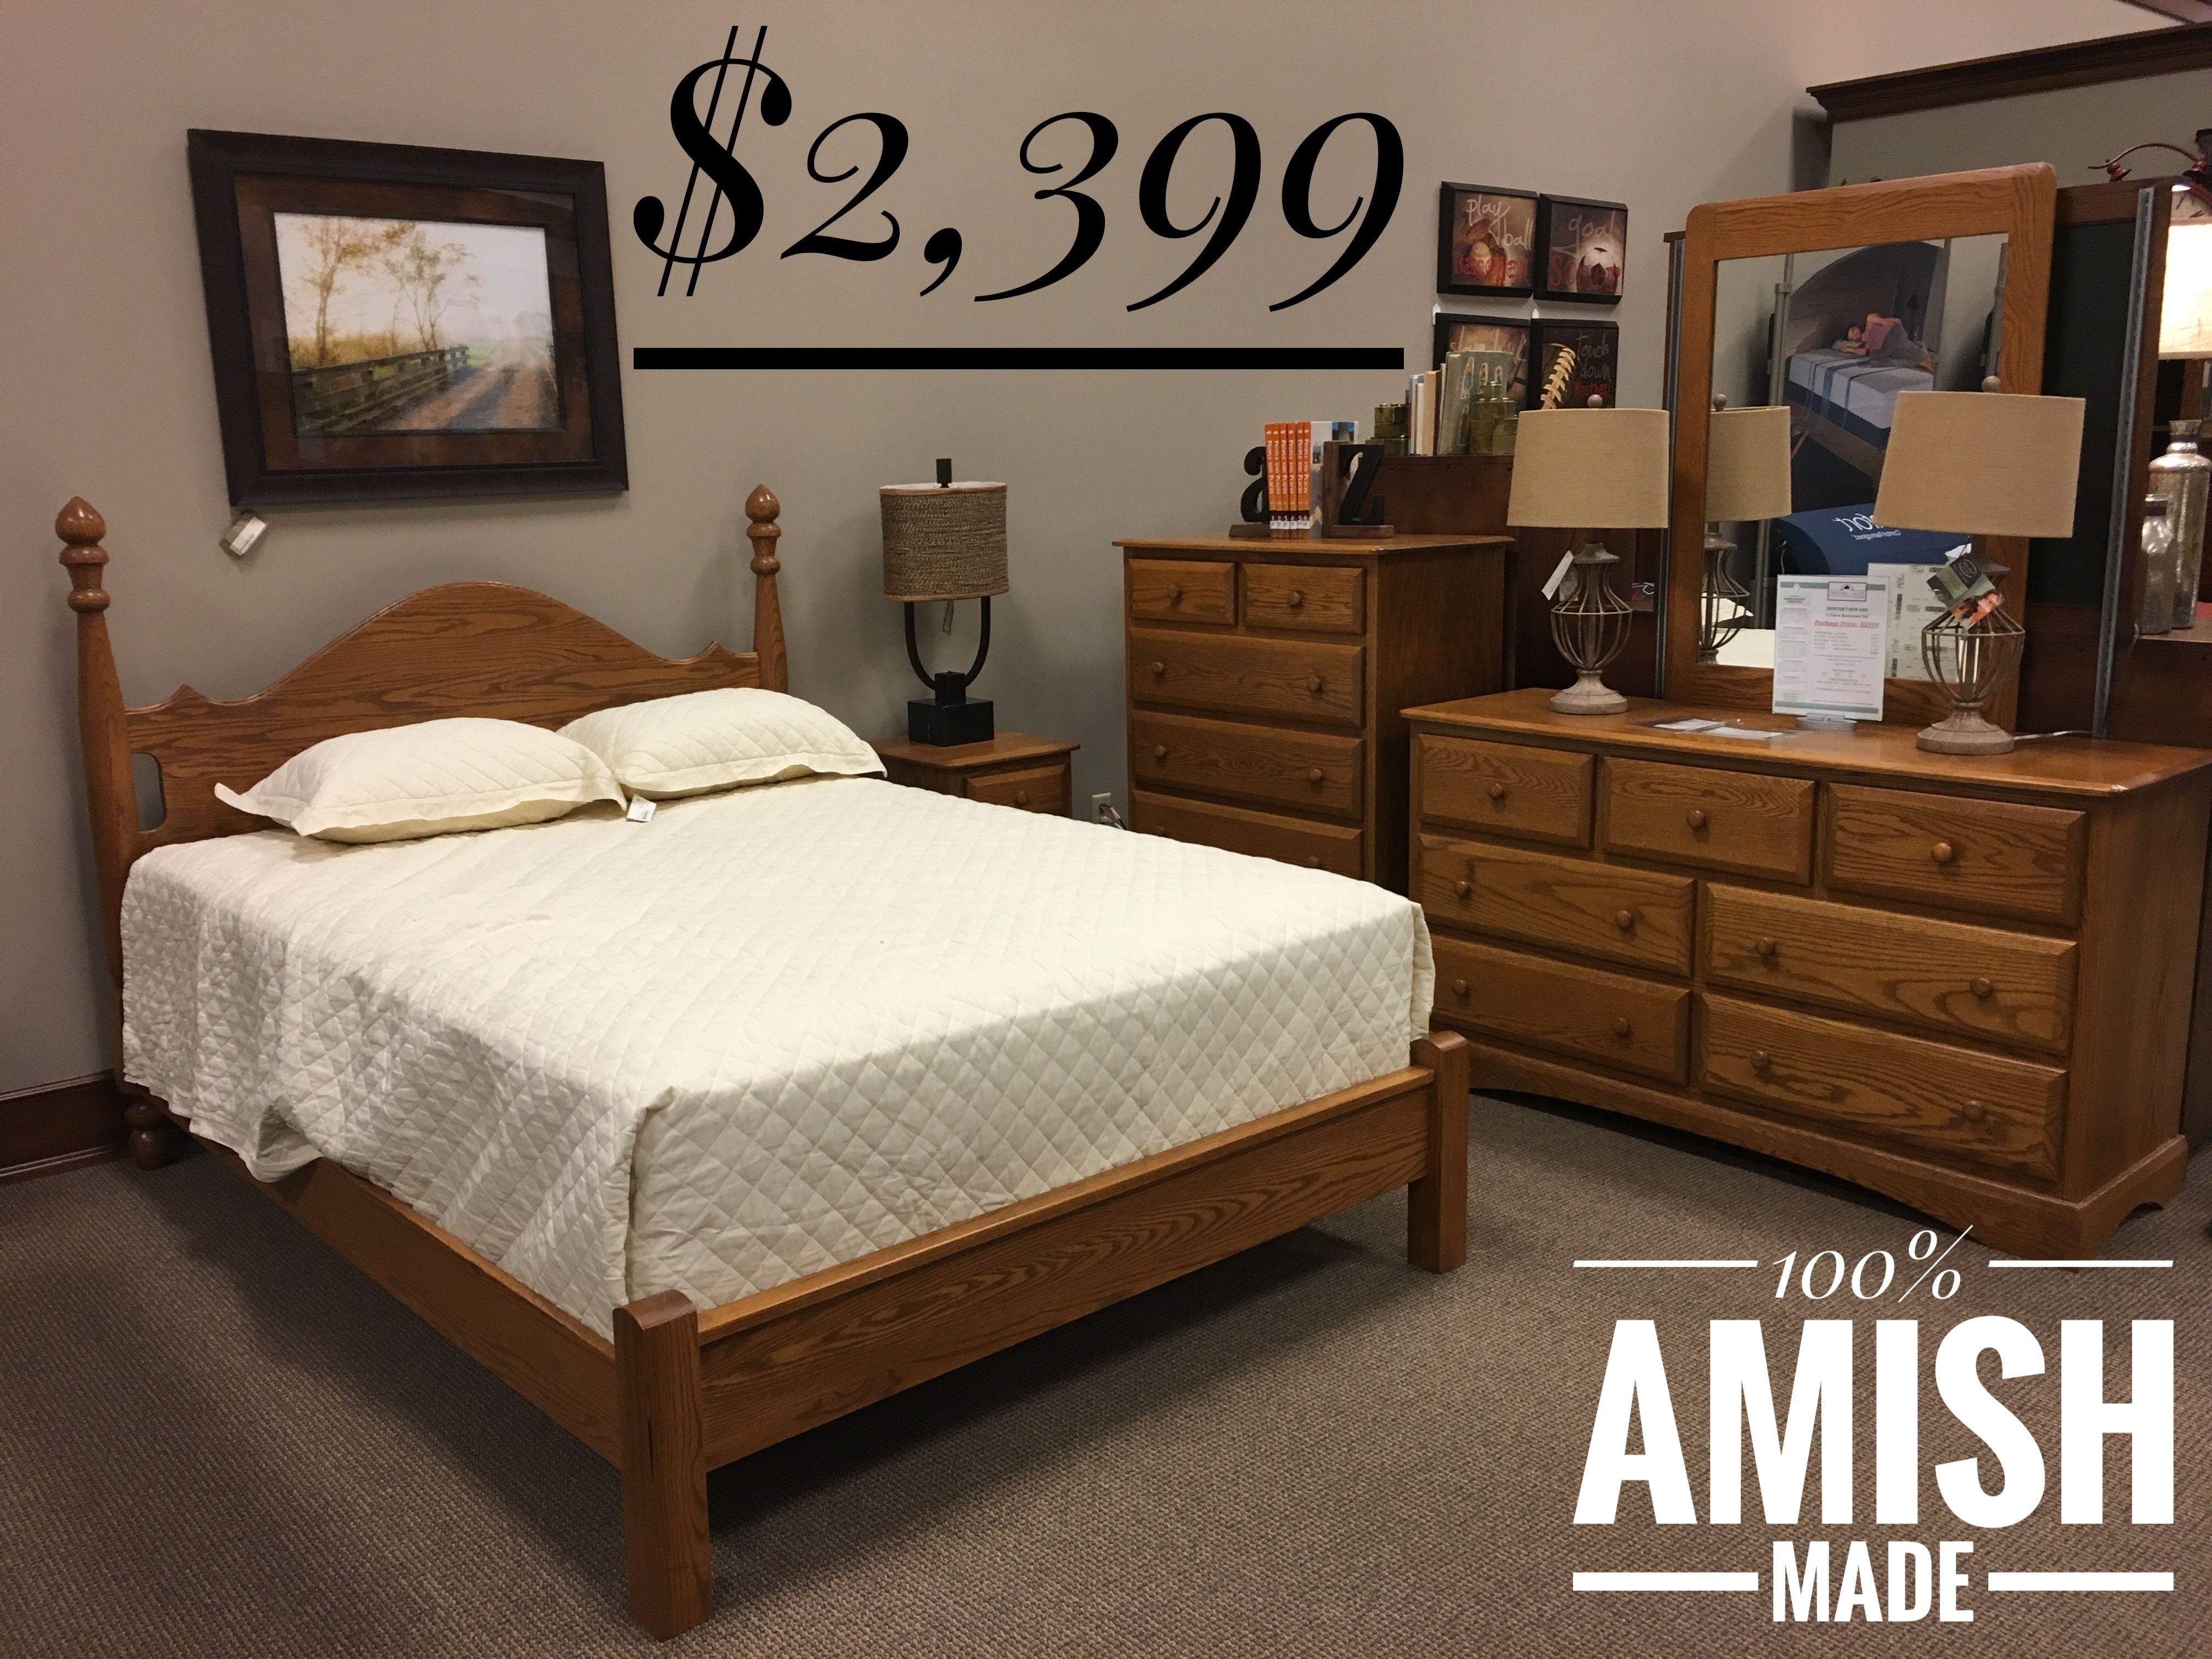 Oak queen bedroom set with medium finish. Call 330440